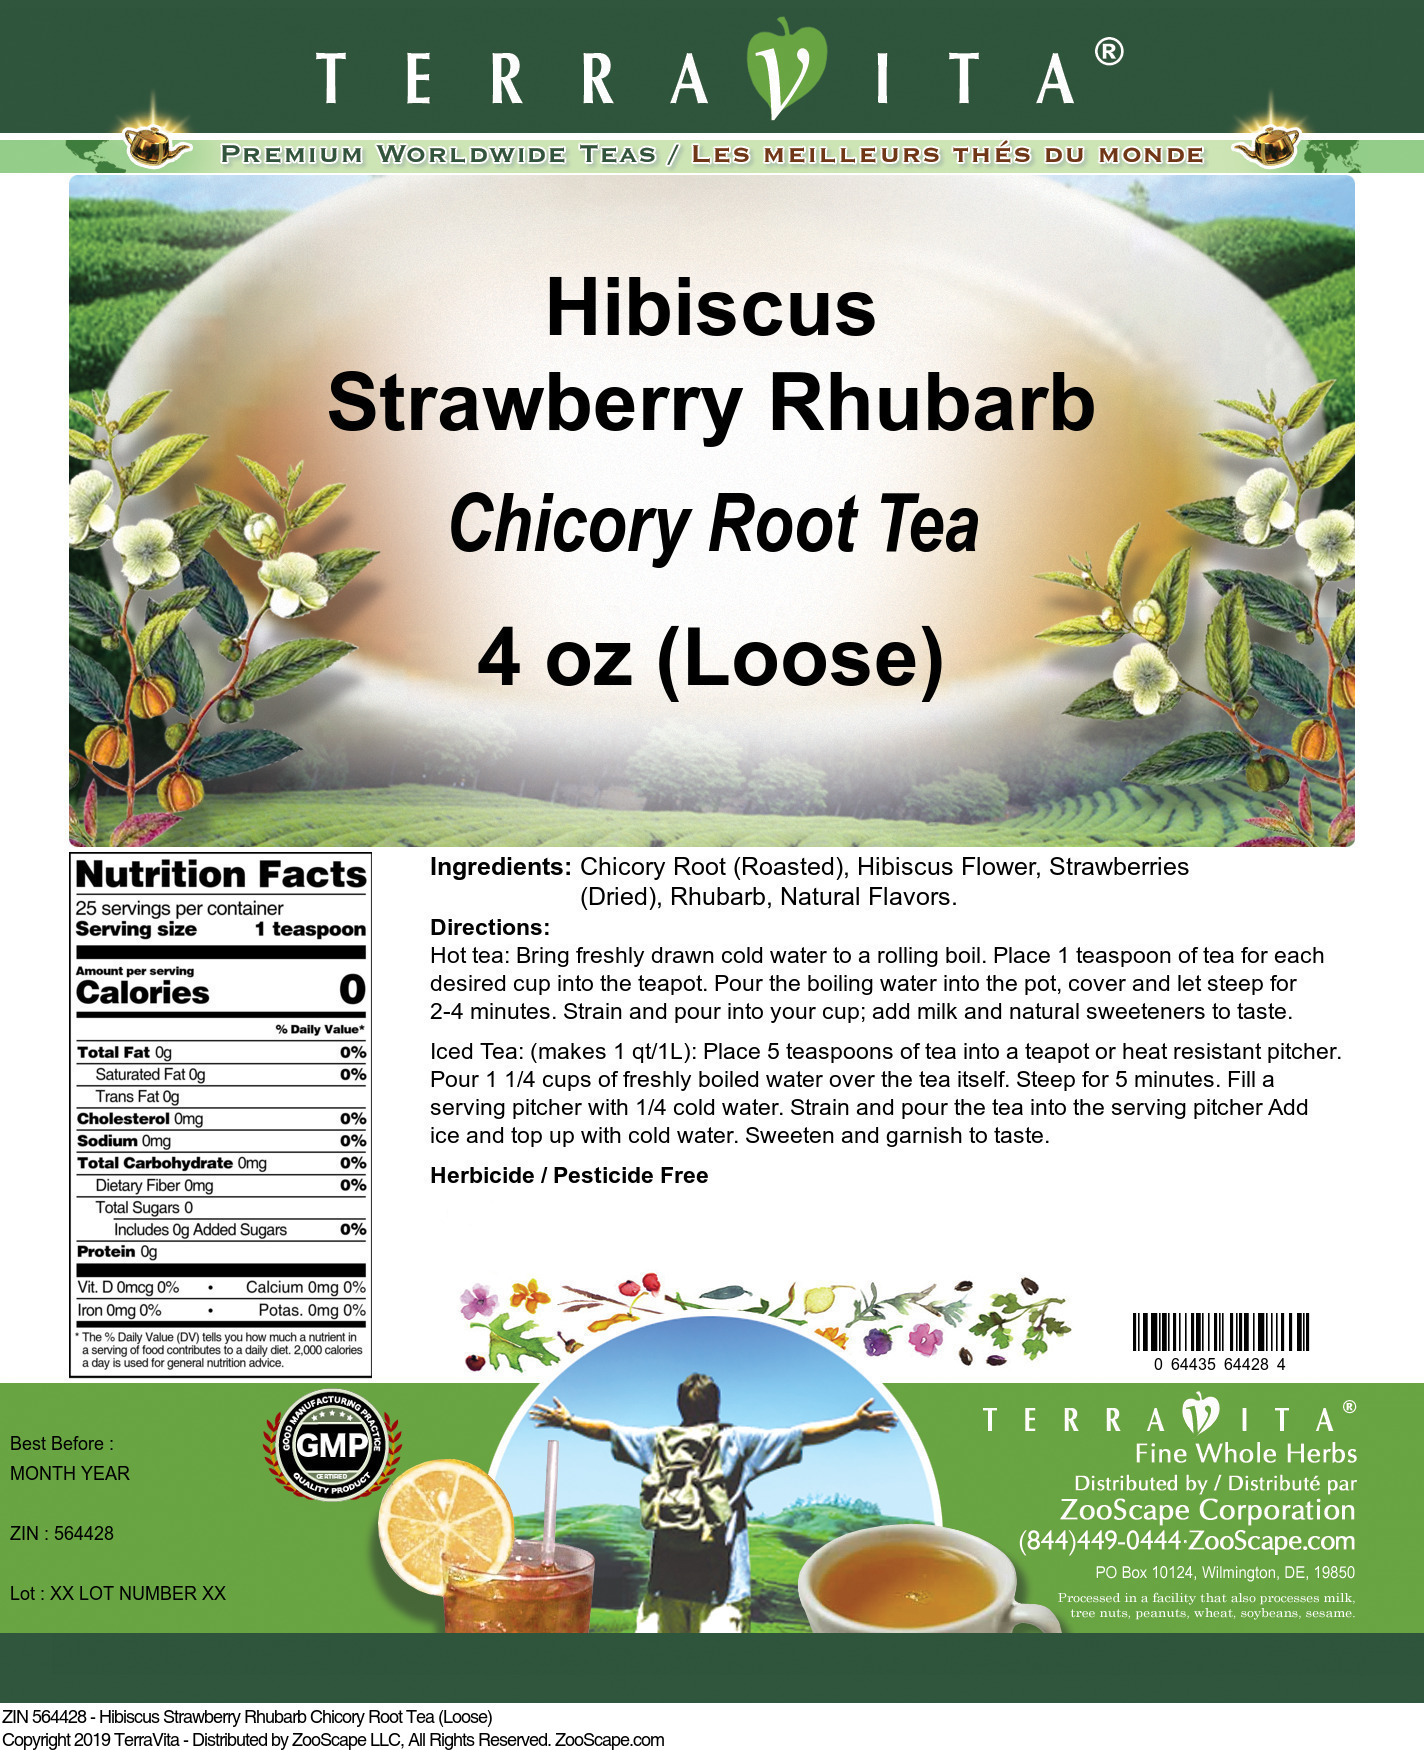 Hibiscus Strawberry Rhubarb Chicory Root Tea (Loose)